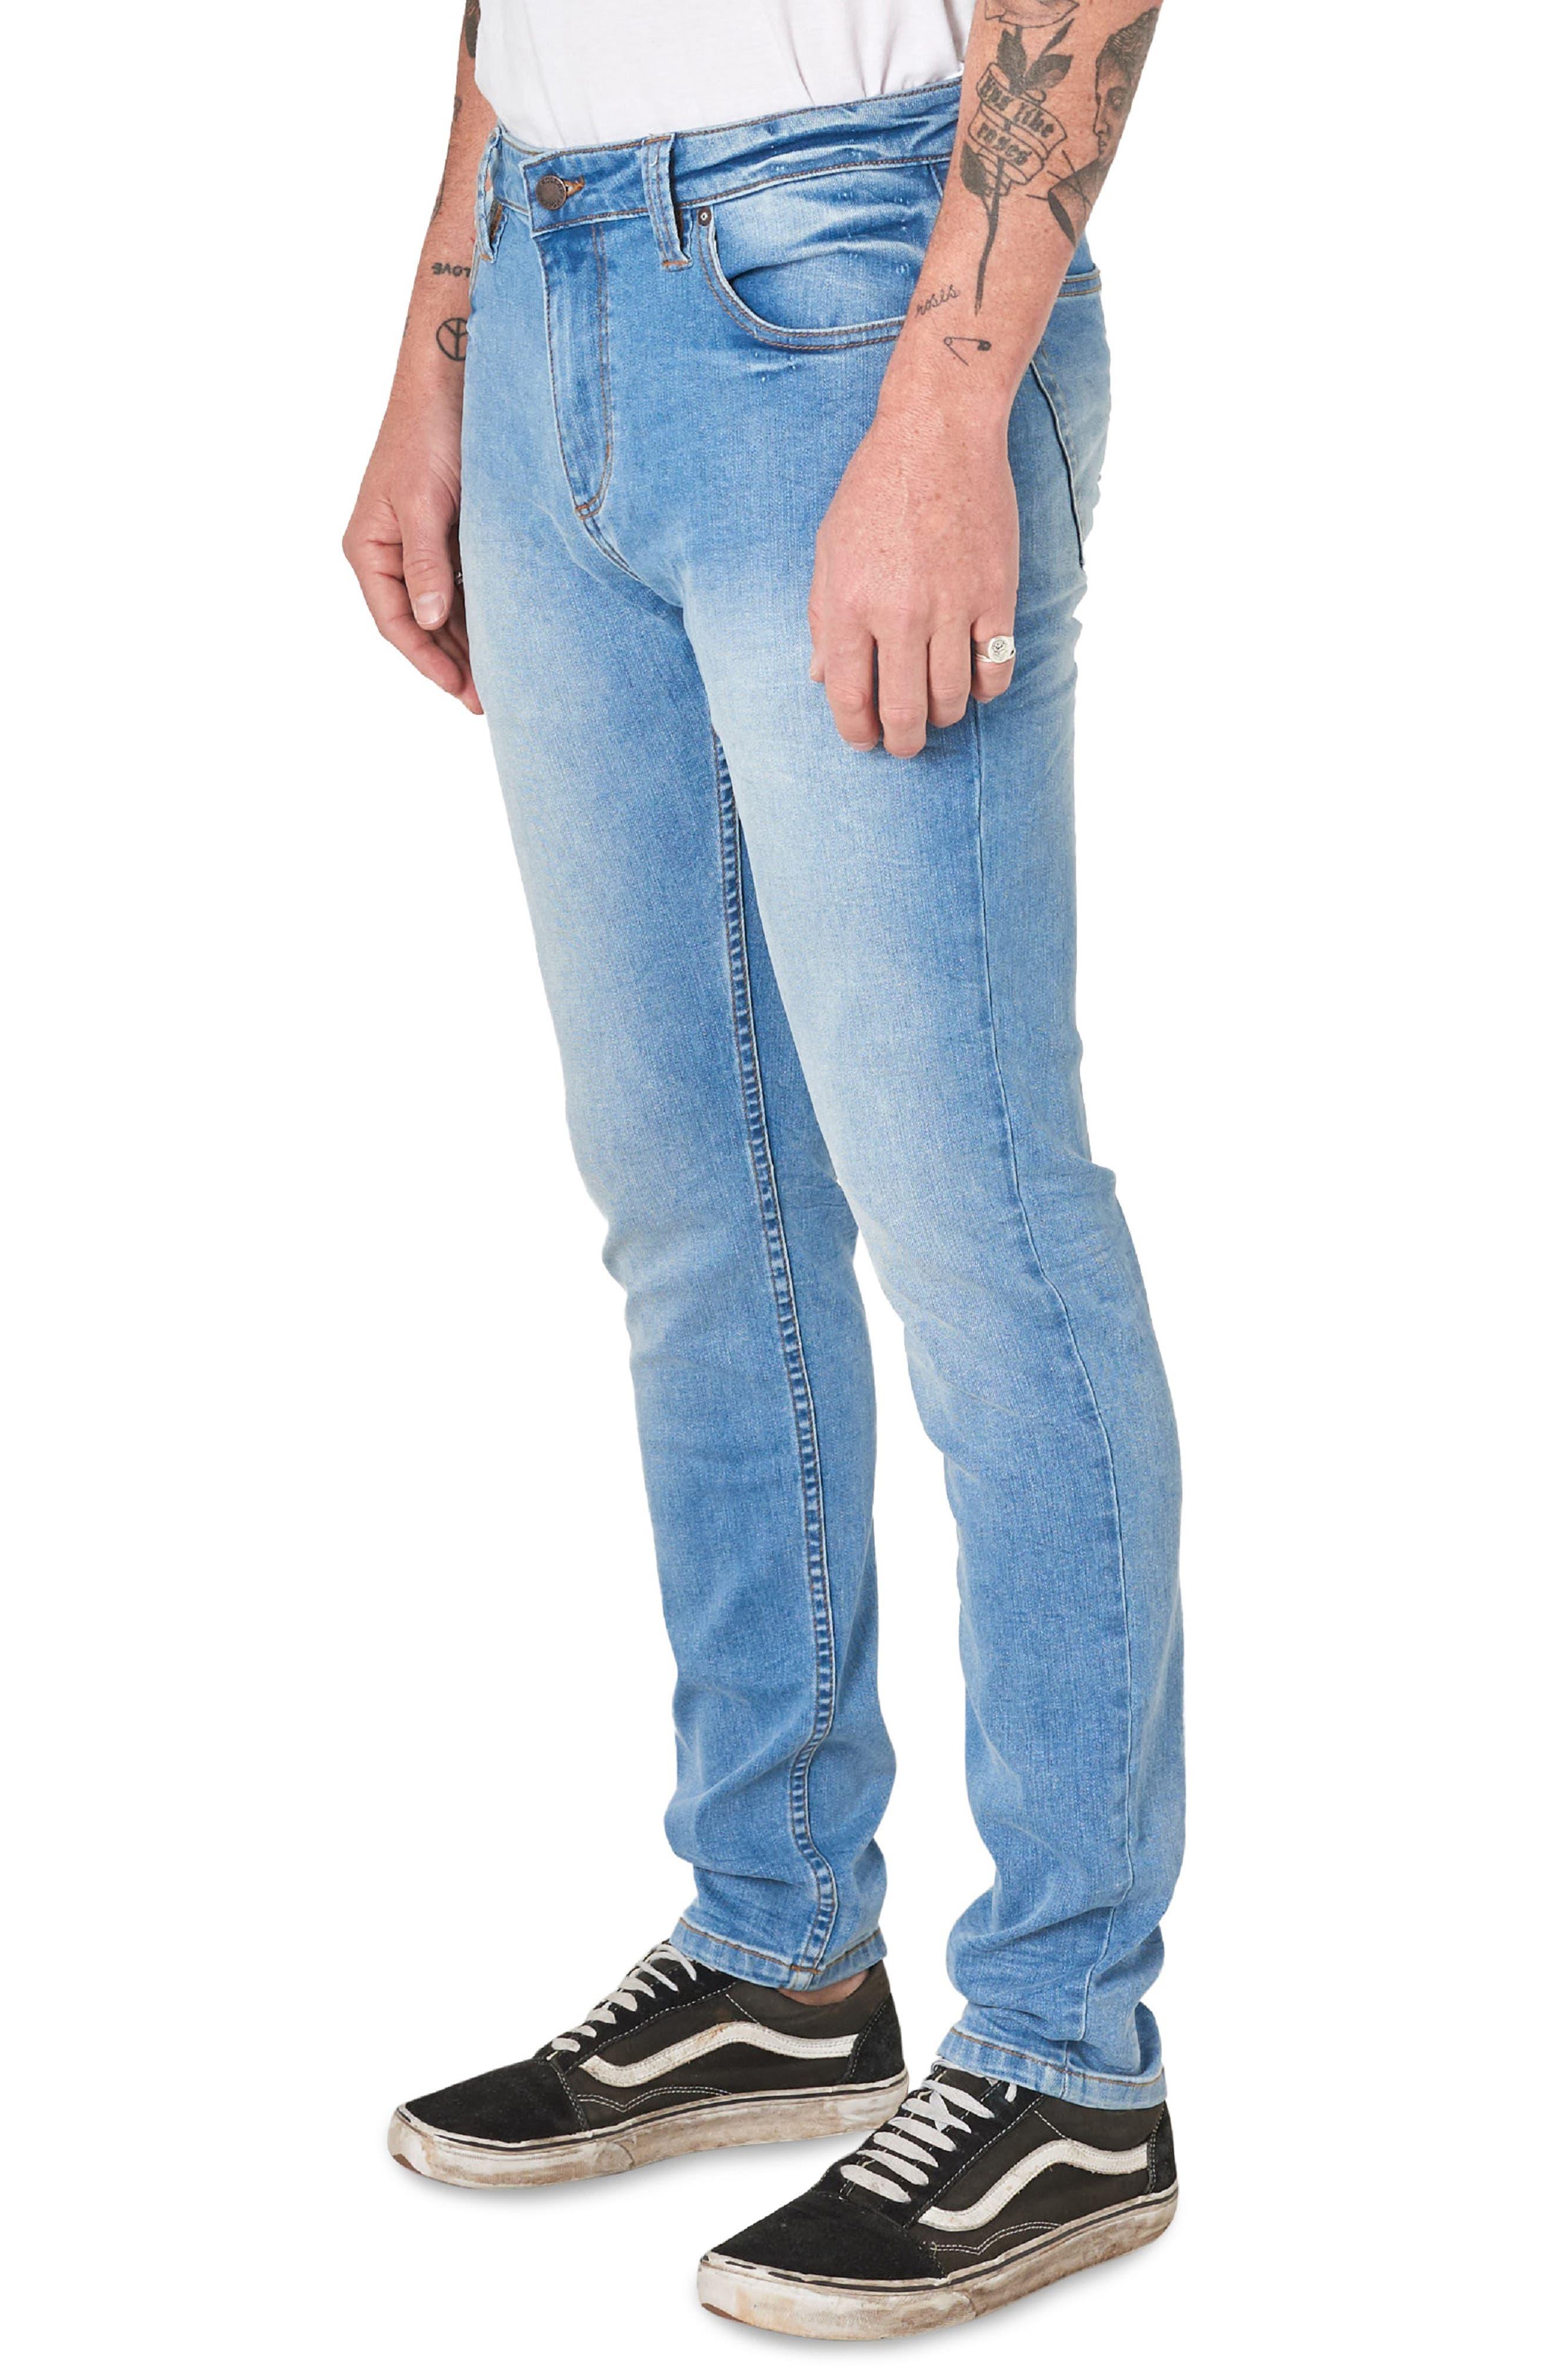 Stinger Skinny Fit Jeans,                             Alternate thumbnail 3, color,                             AUTHENTIC BLUE